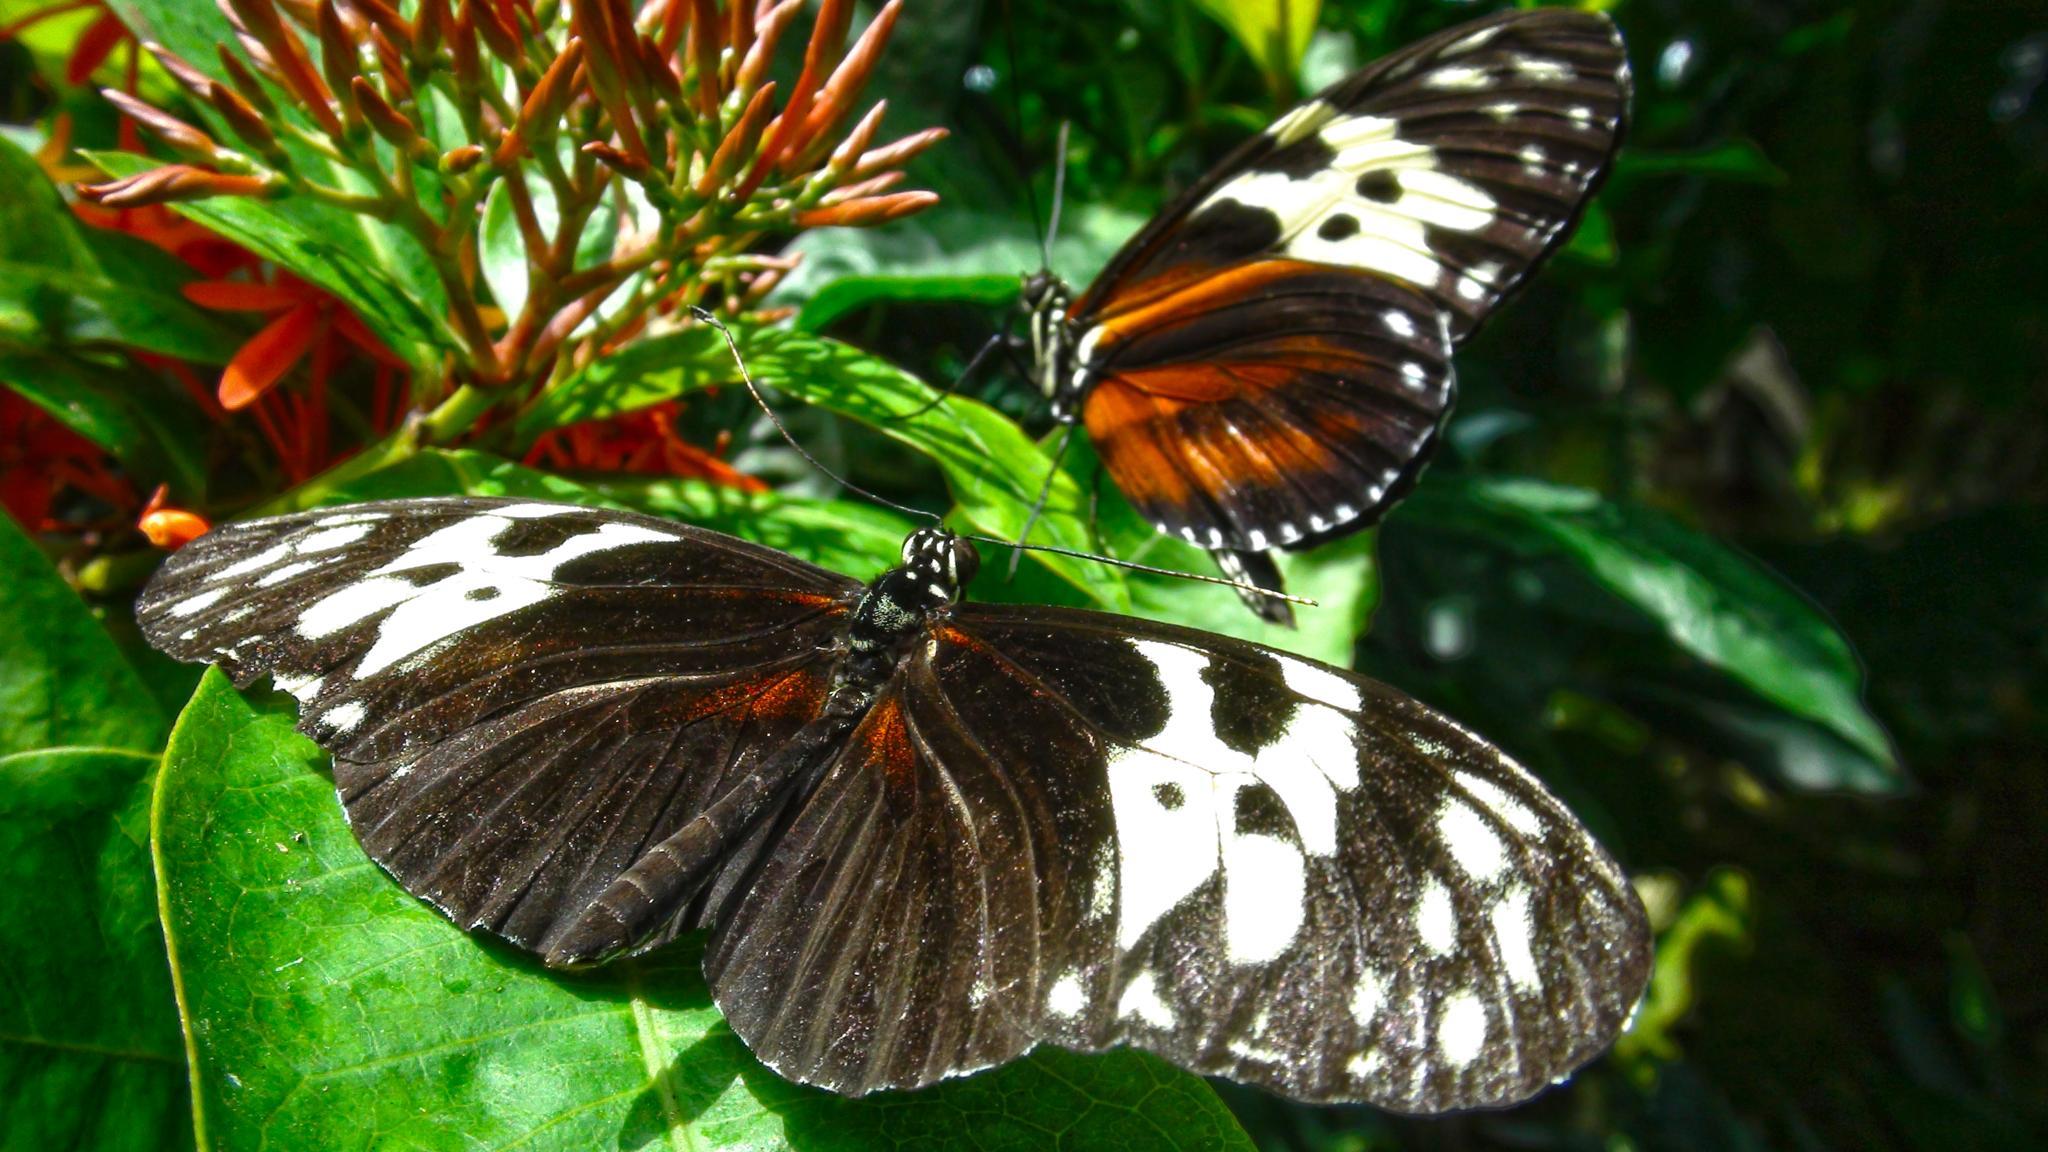 I Love Butterflies by ʎpɐן uɐıpɐuɐɔ